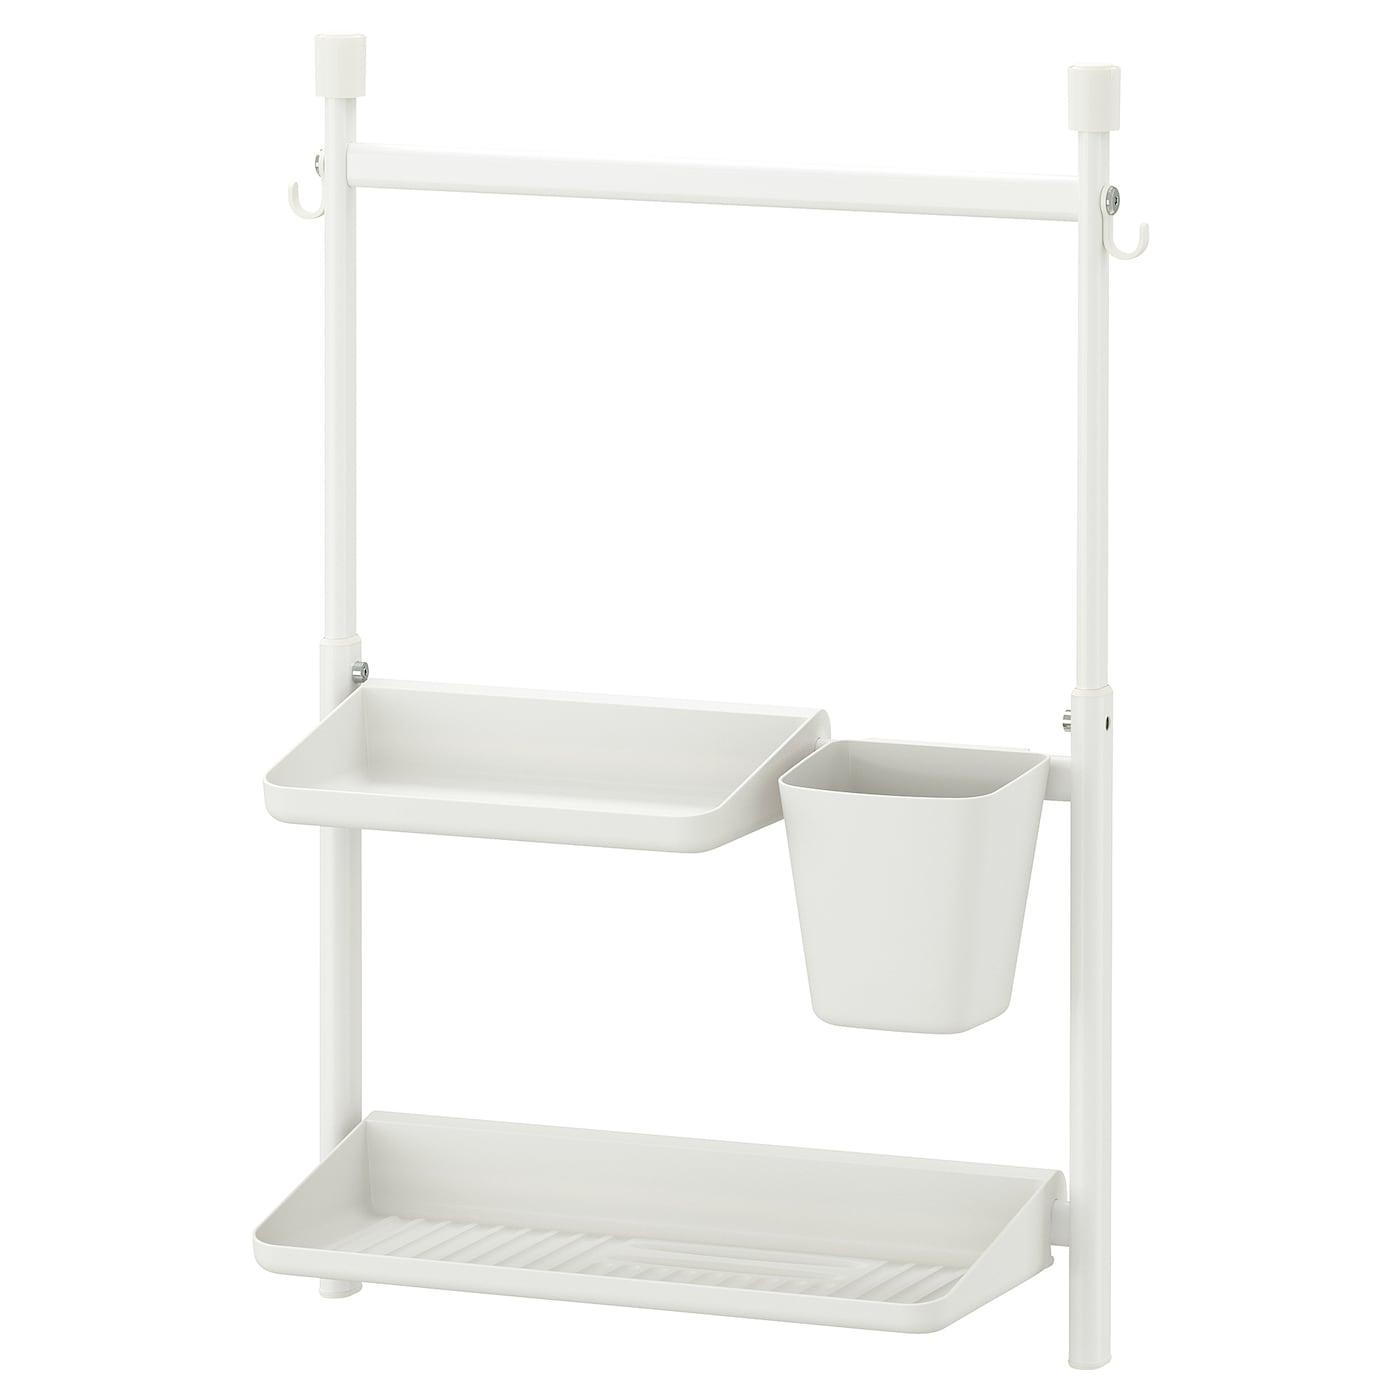 Sunnersta Opbergset Keuken Zonder Boren Plank Afdruiprek Bak Ikea